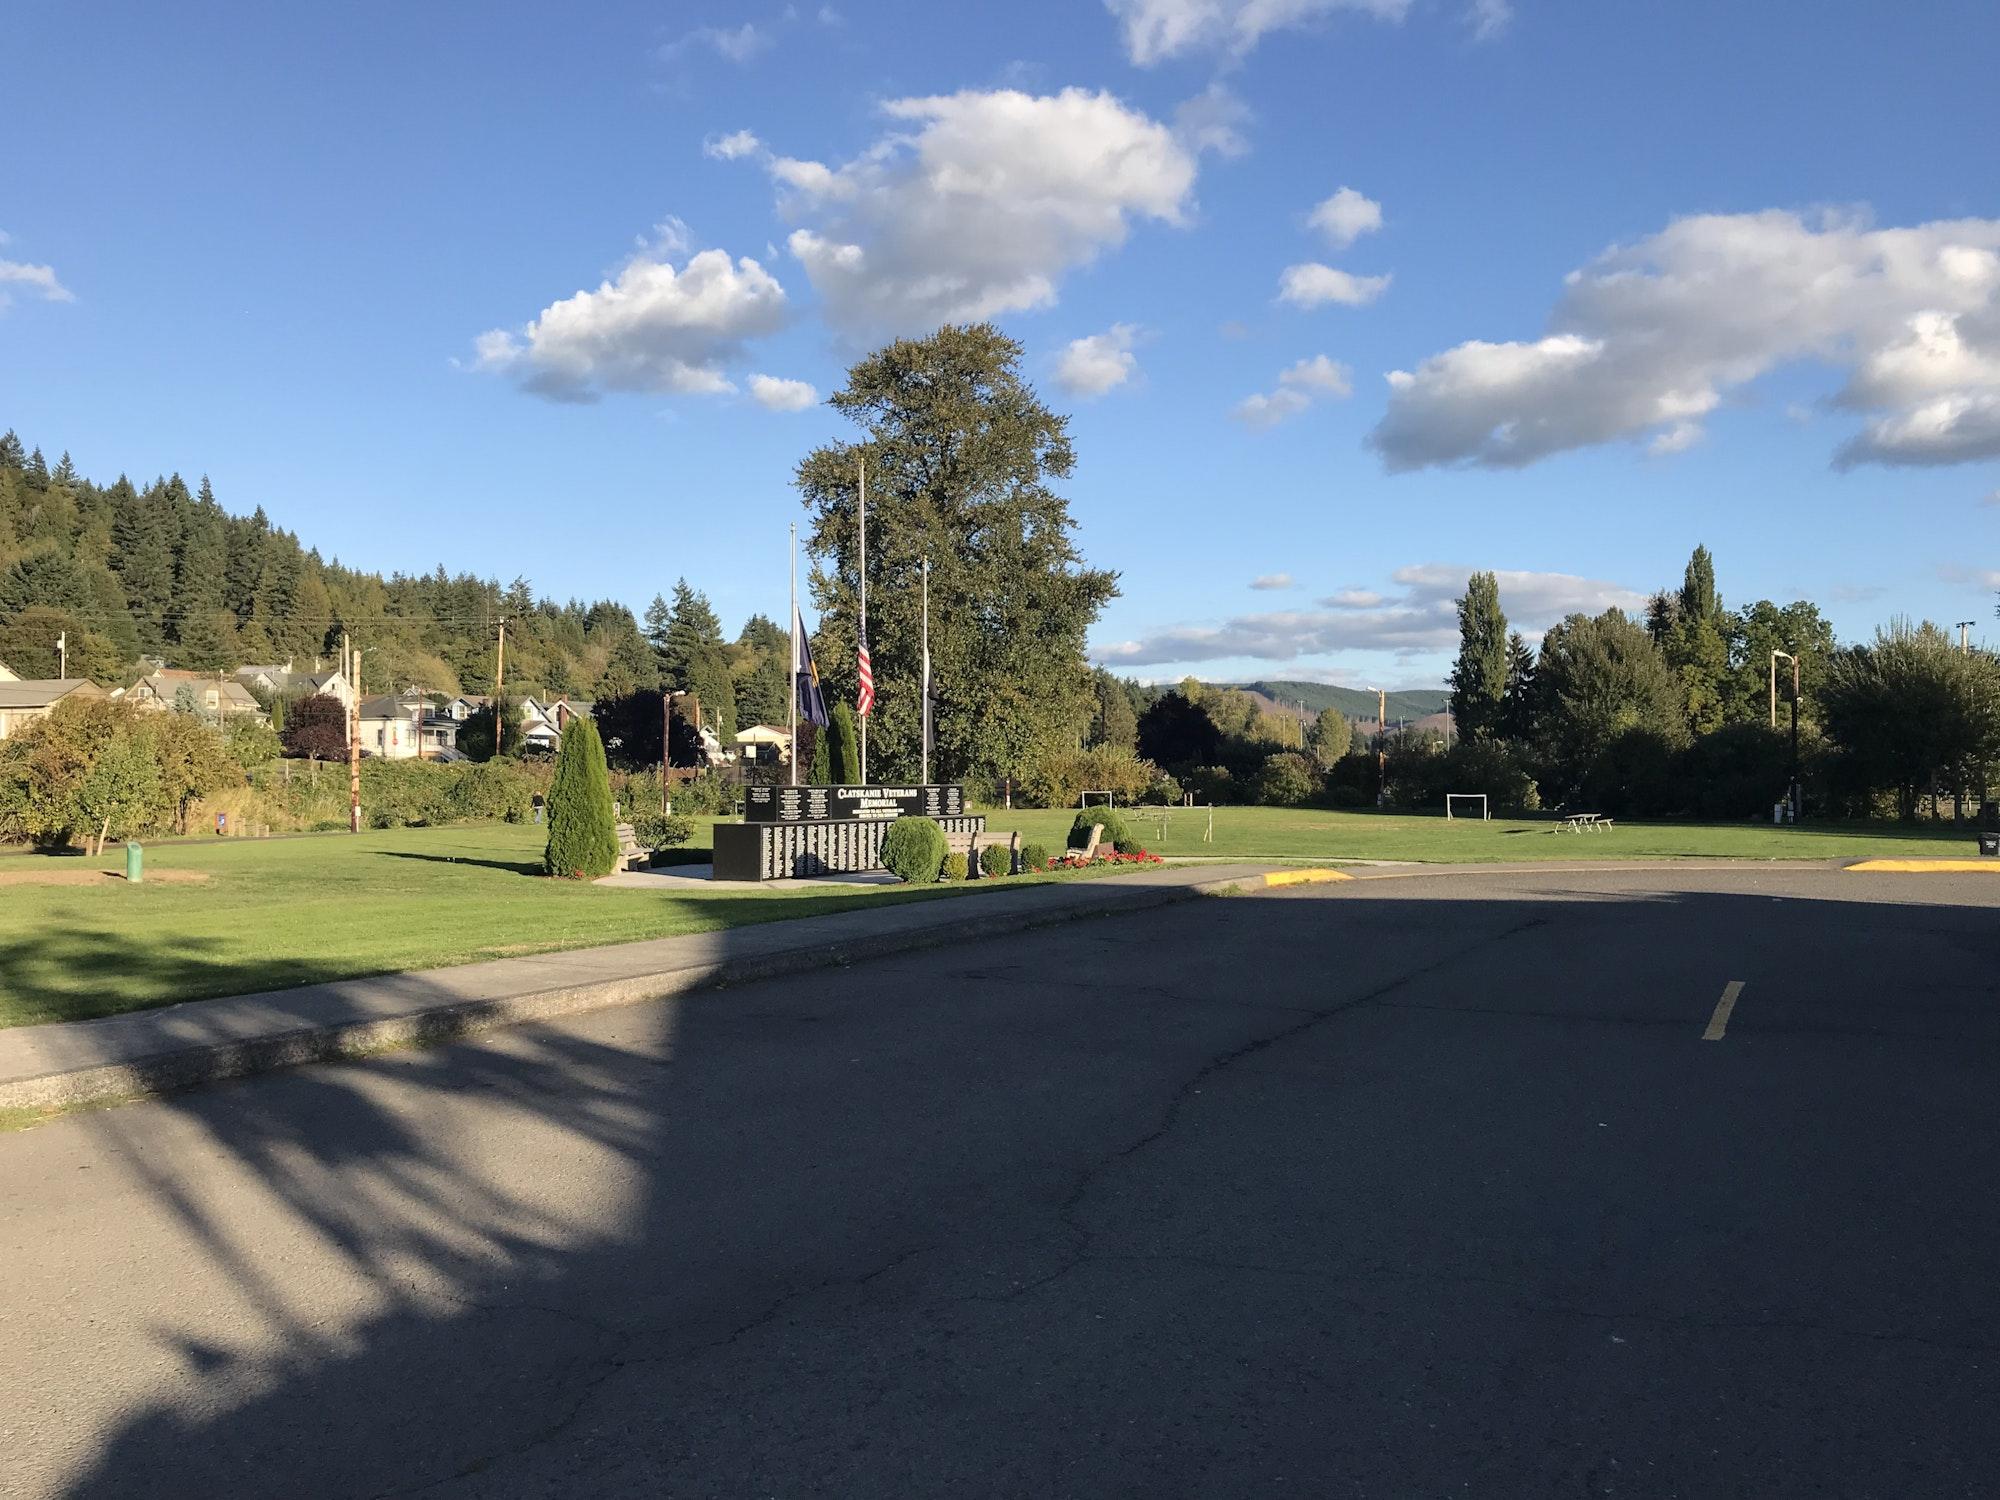 May contain: asphalt, tarmac, road, and outdoors